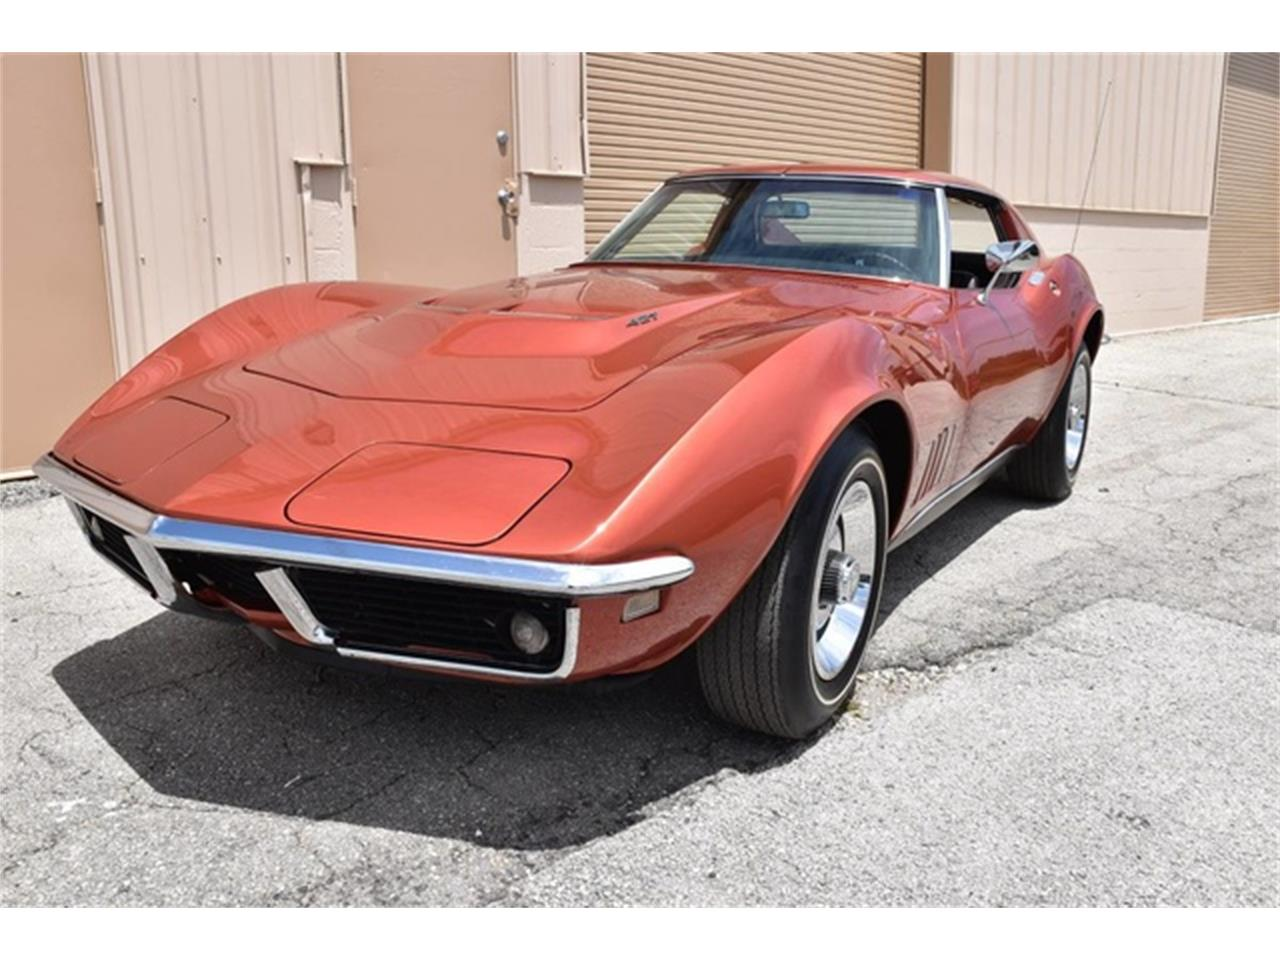 1968 Chevrolet Corvette (CC-1299362) for sale in Scottsdale, Arizona